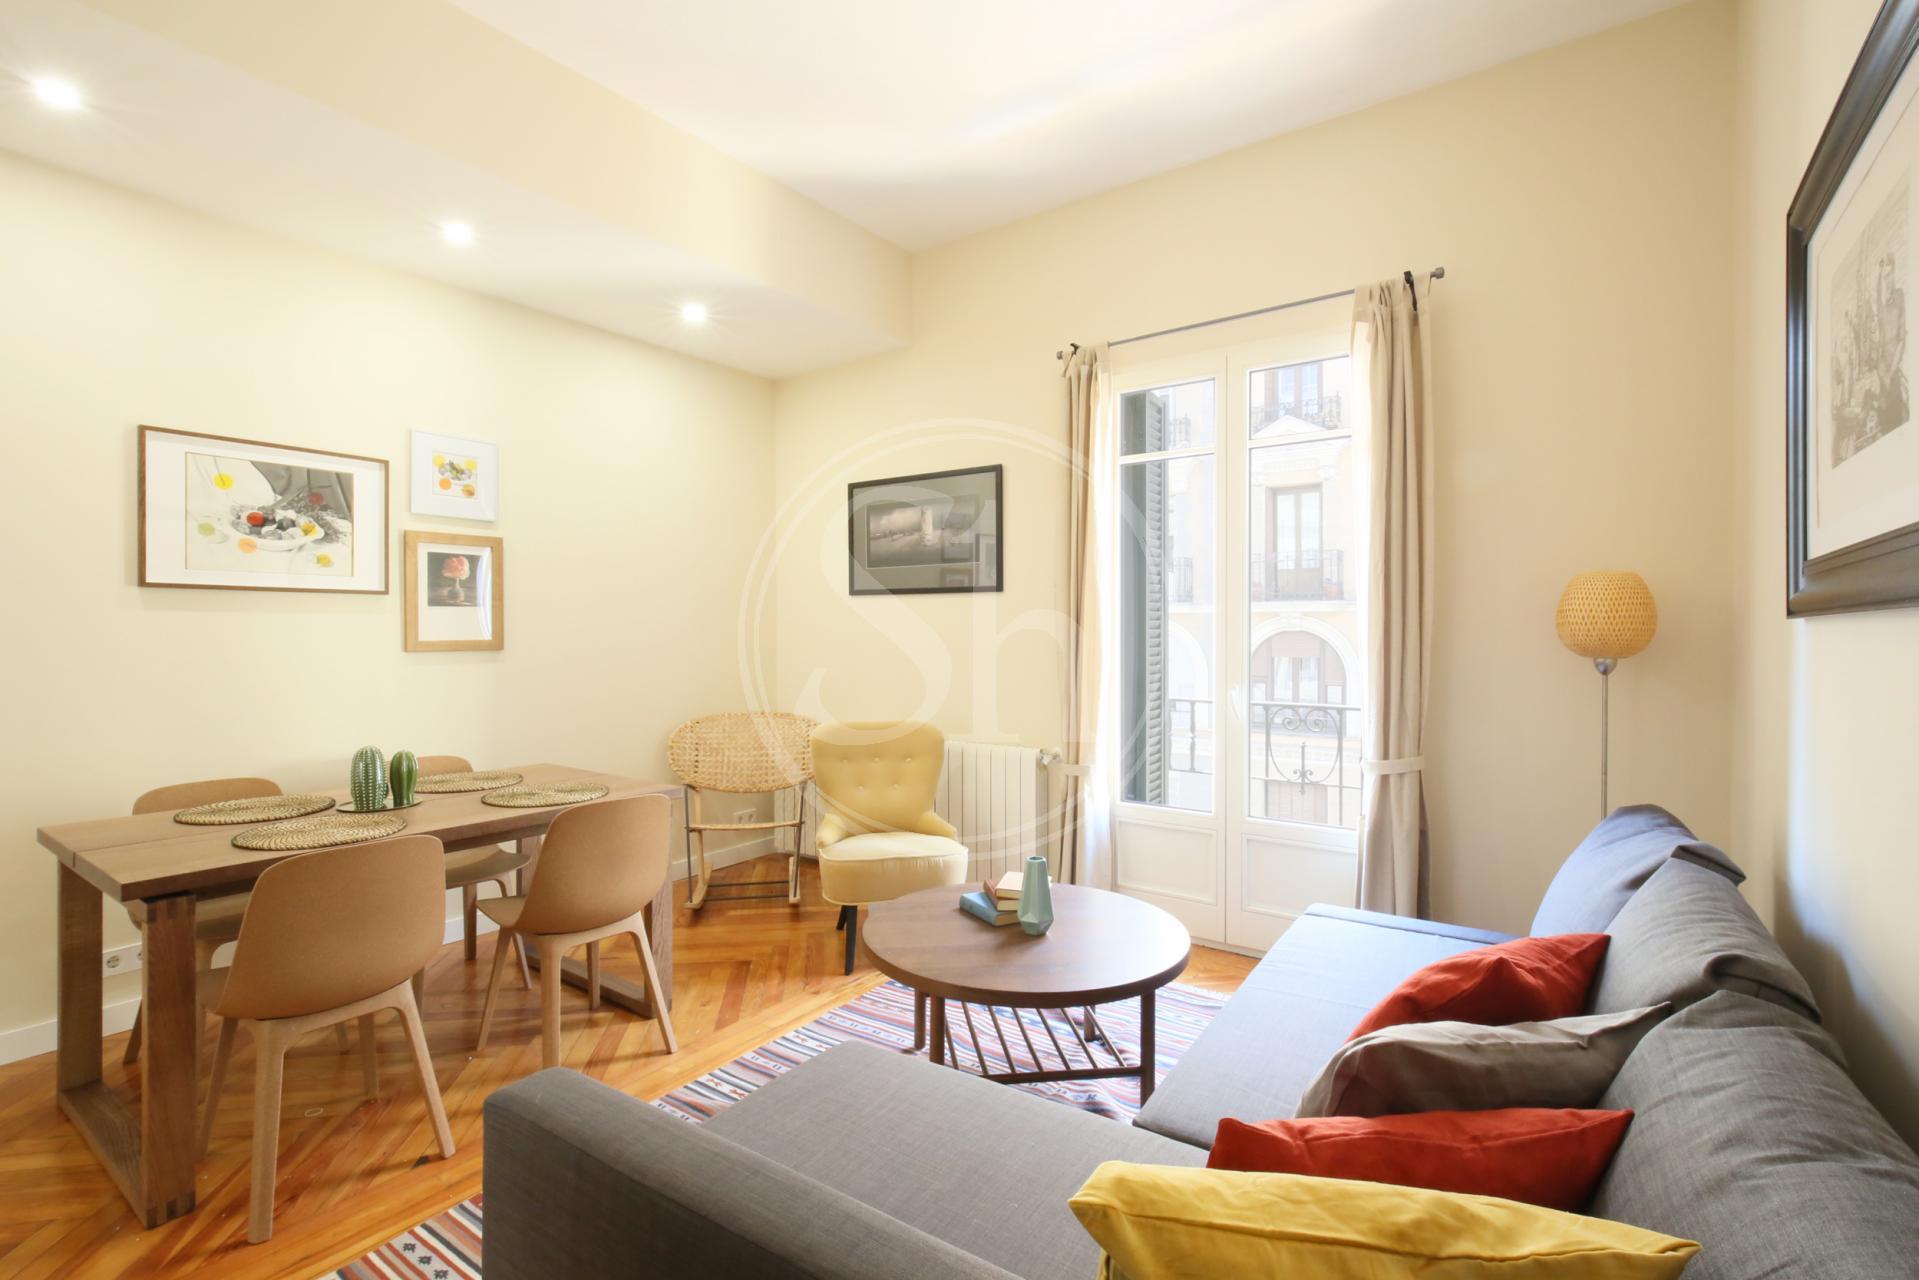 Appartement à louer à Madrid Covarrubias - Chamberi